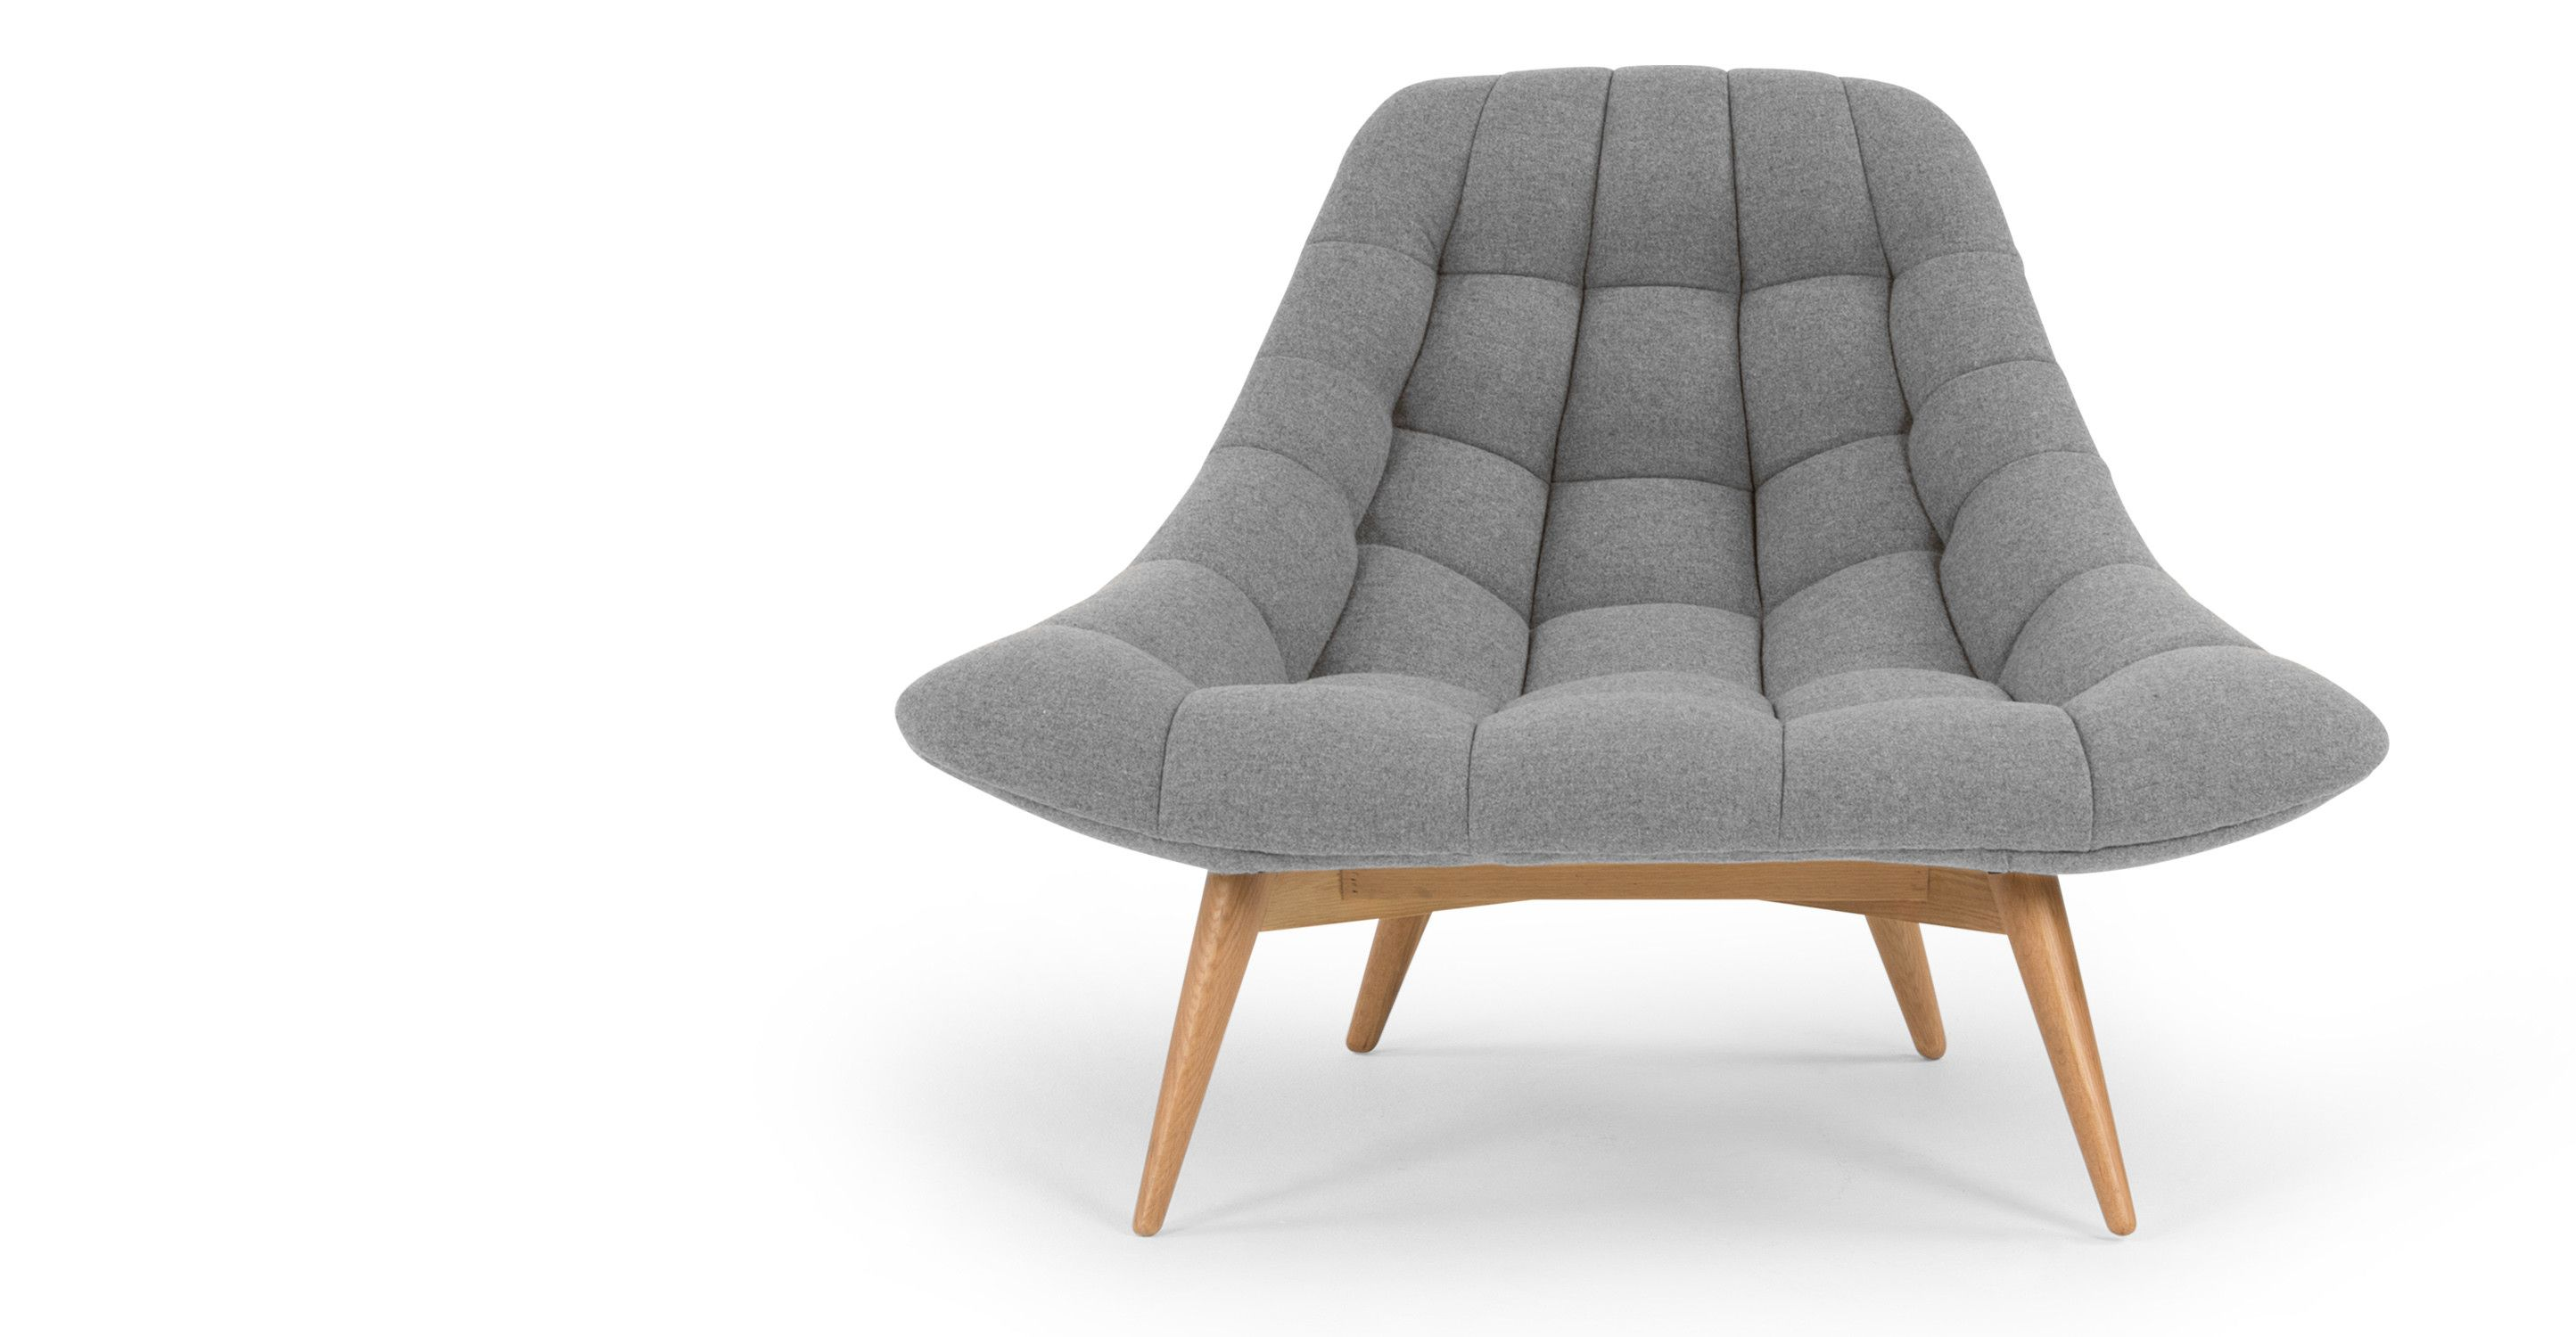 Ohrensessel modern grau  Kolton fauteuil, opaalgrijs | made.com | Home is where the heart ...